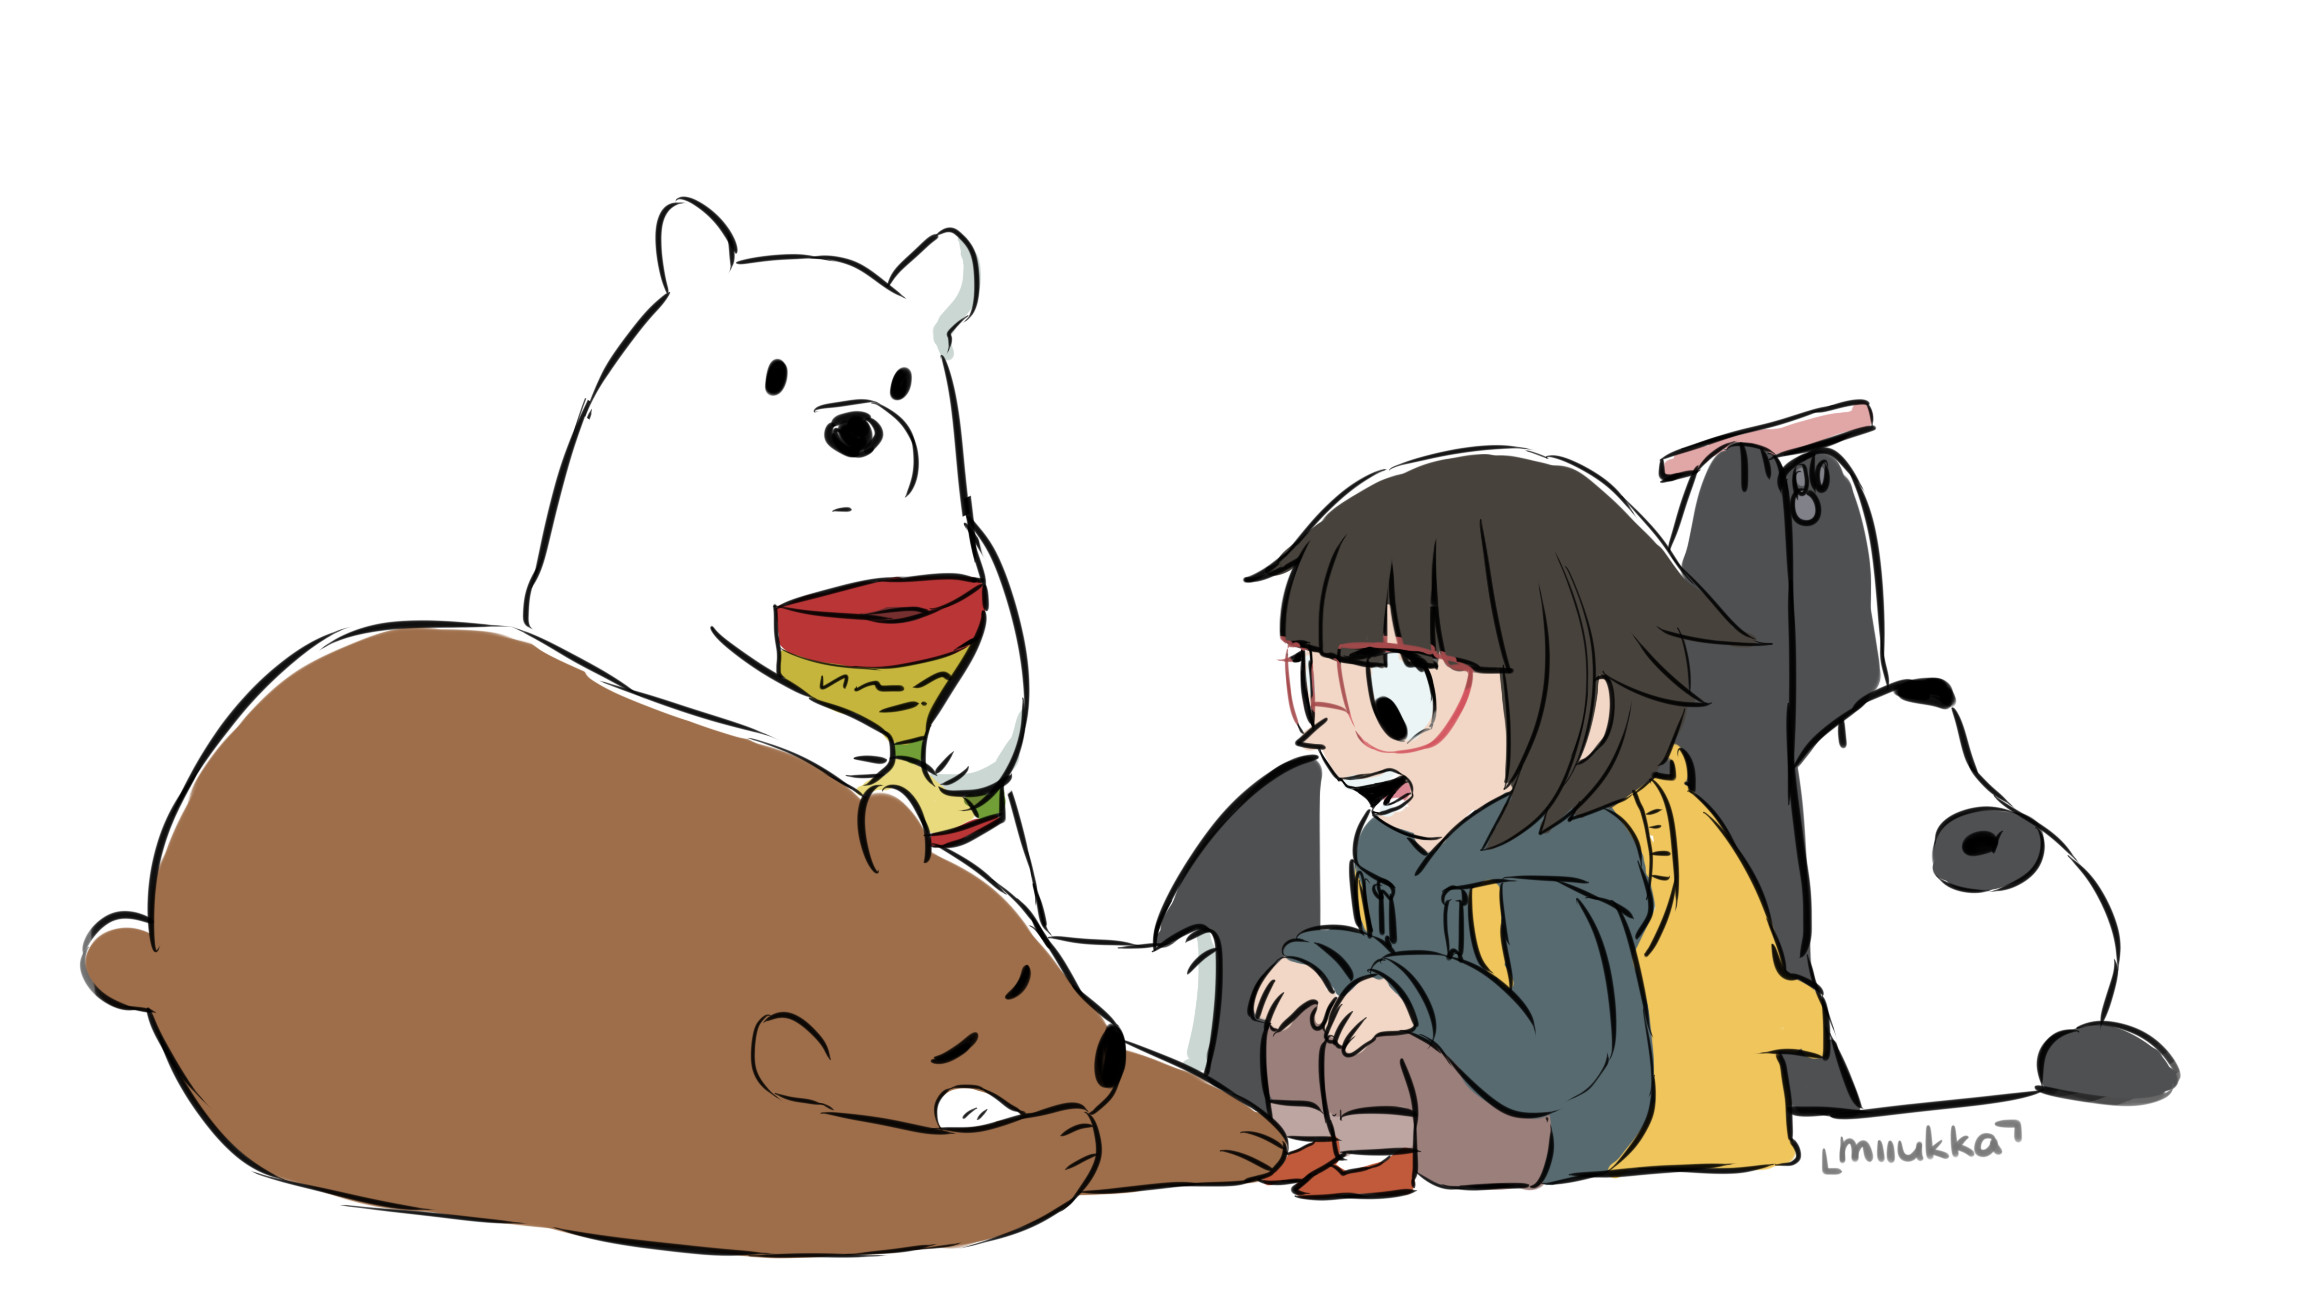 We Bare Bears by Miiukka We Bare Bears by Miiukka